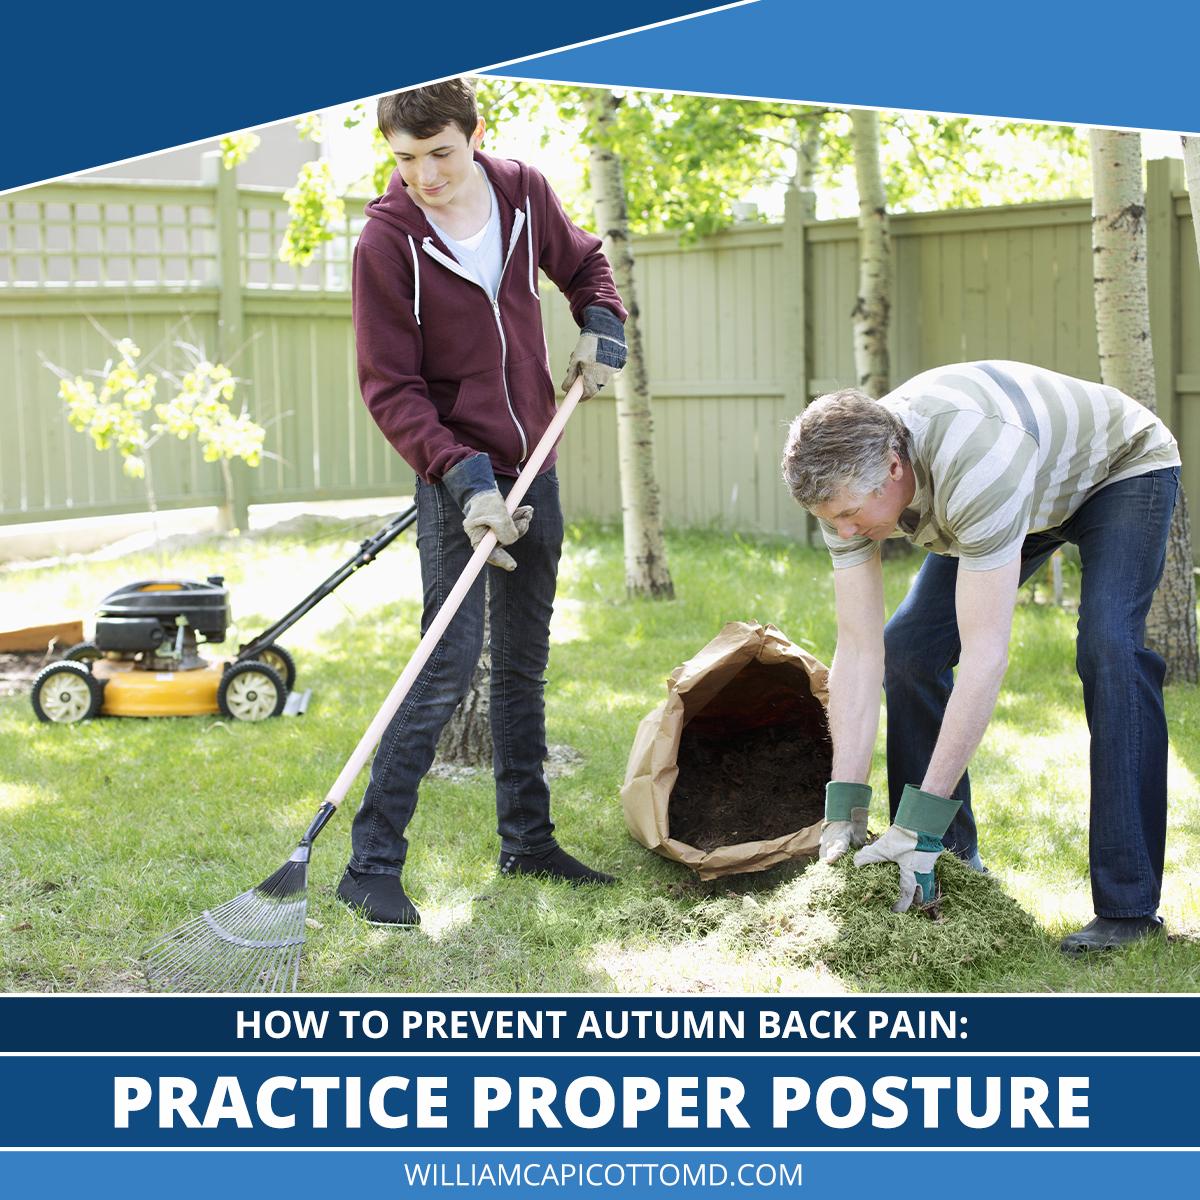 Practice Proper Posture